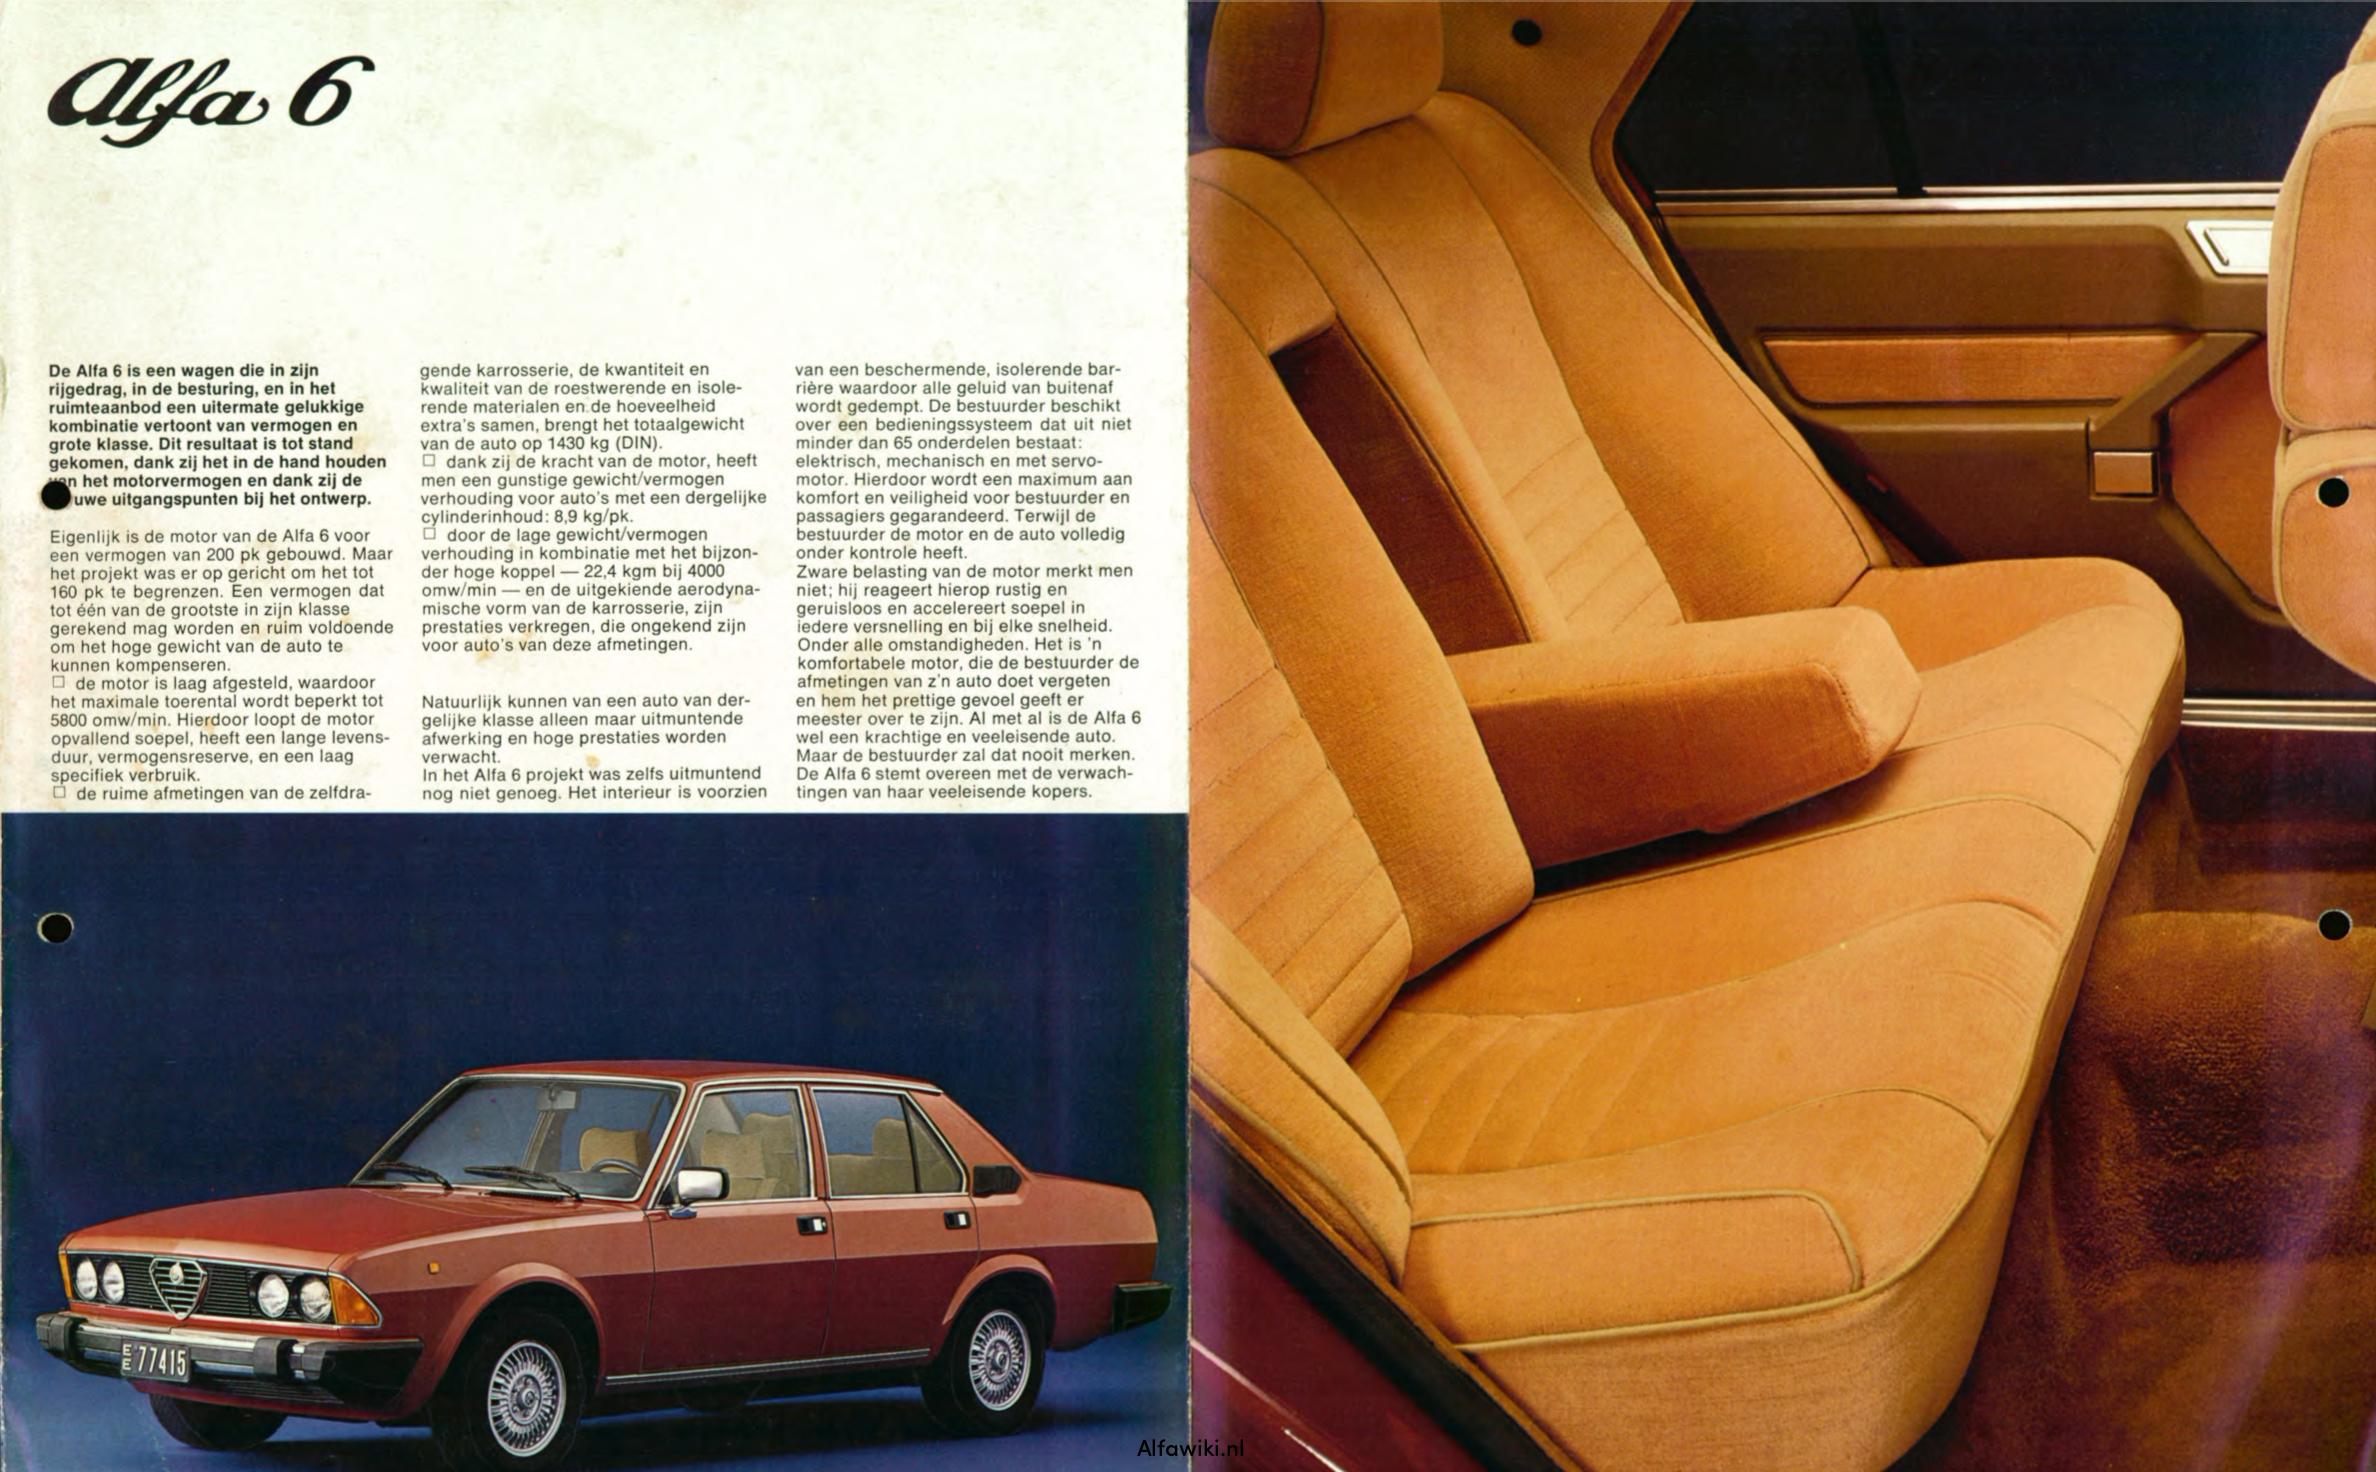 Alfa Romeo 6 brochure